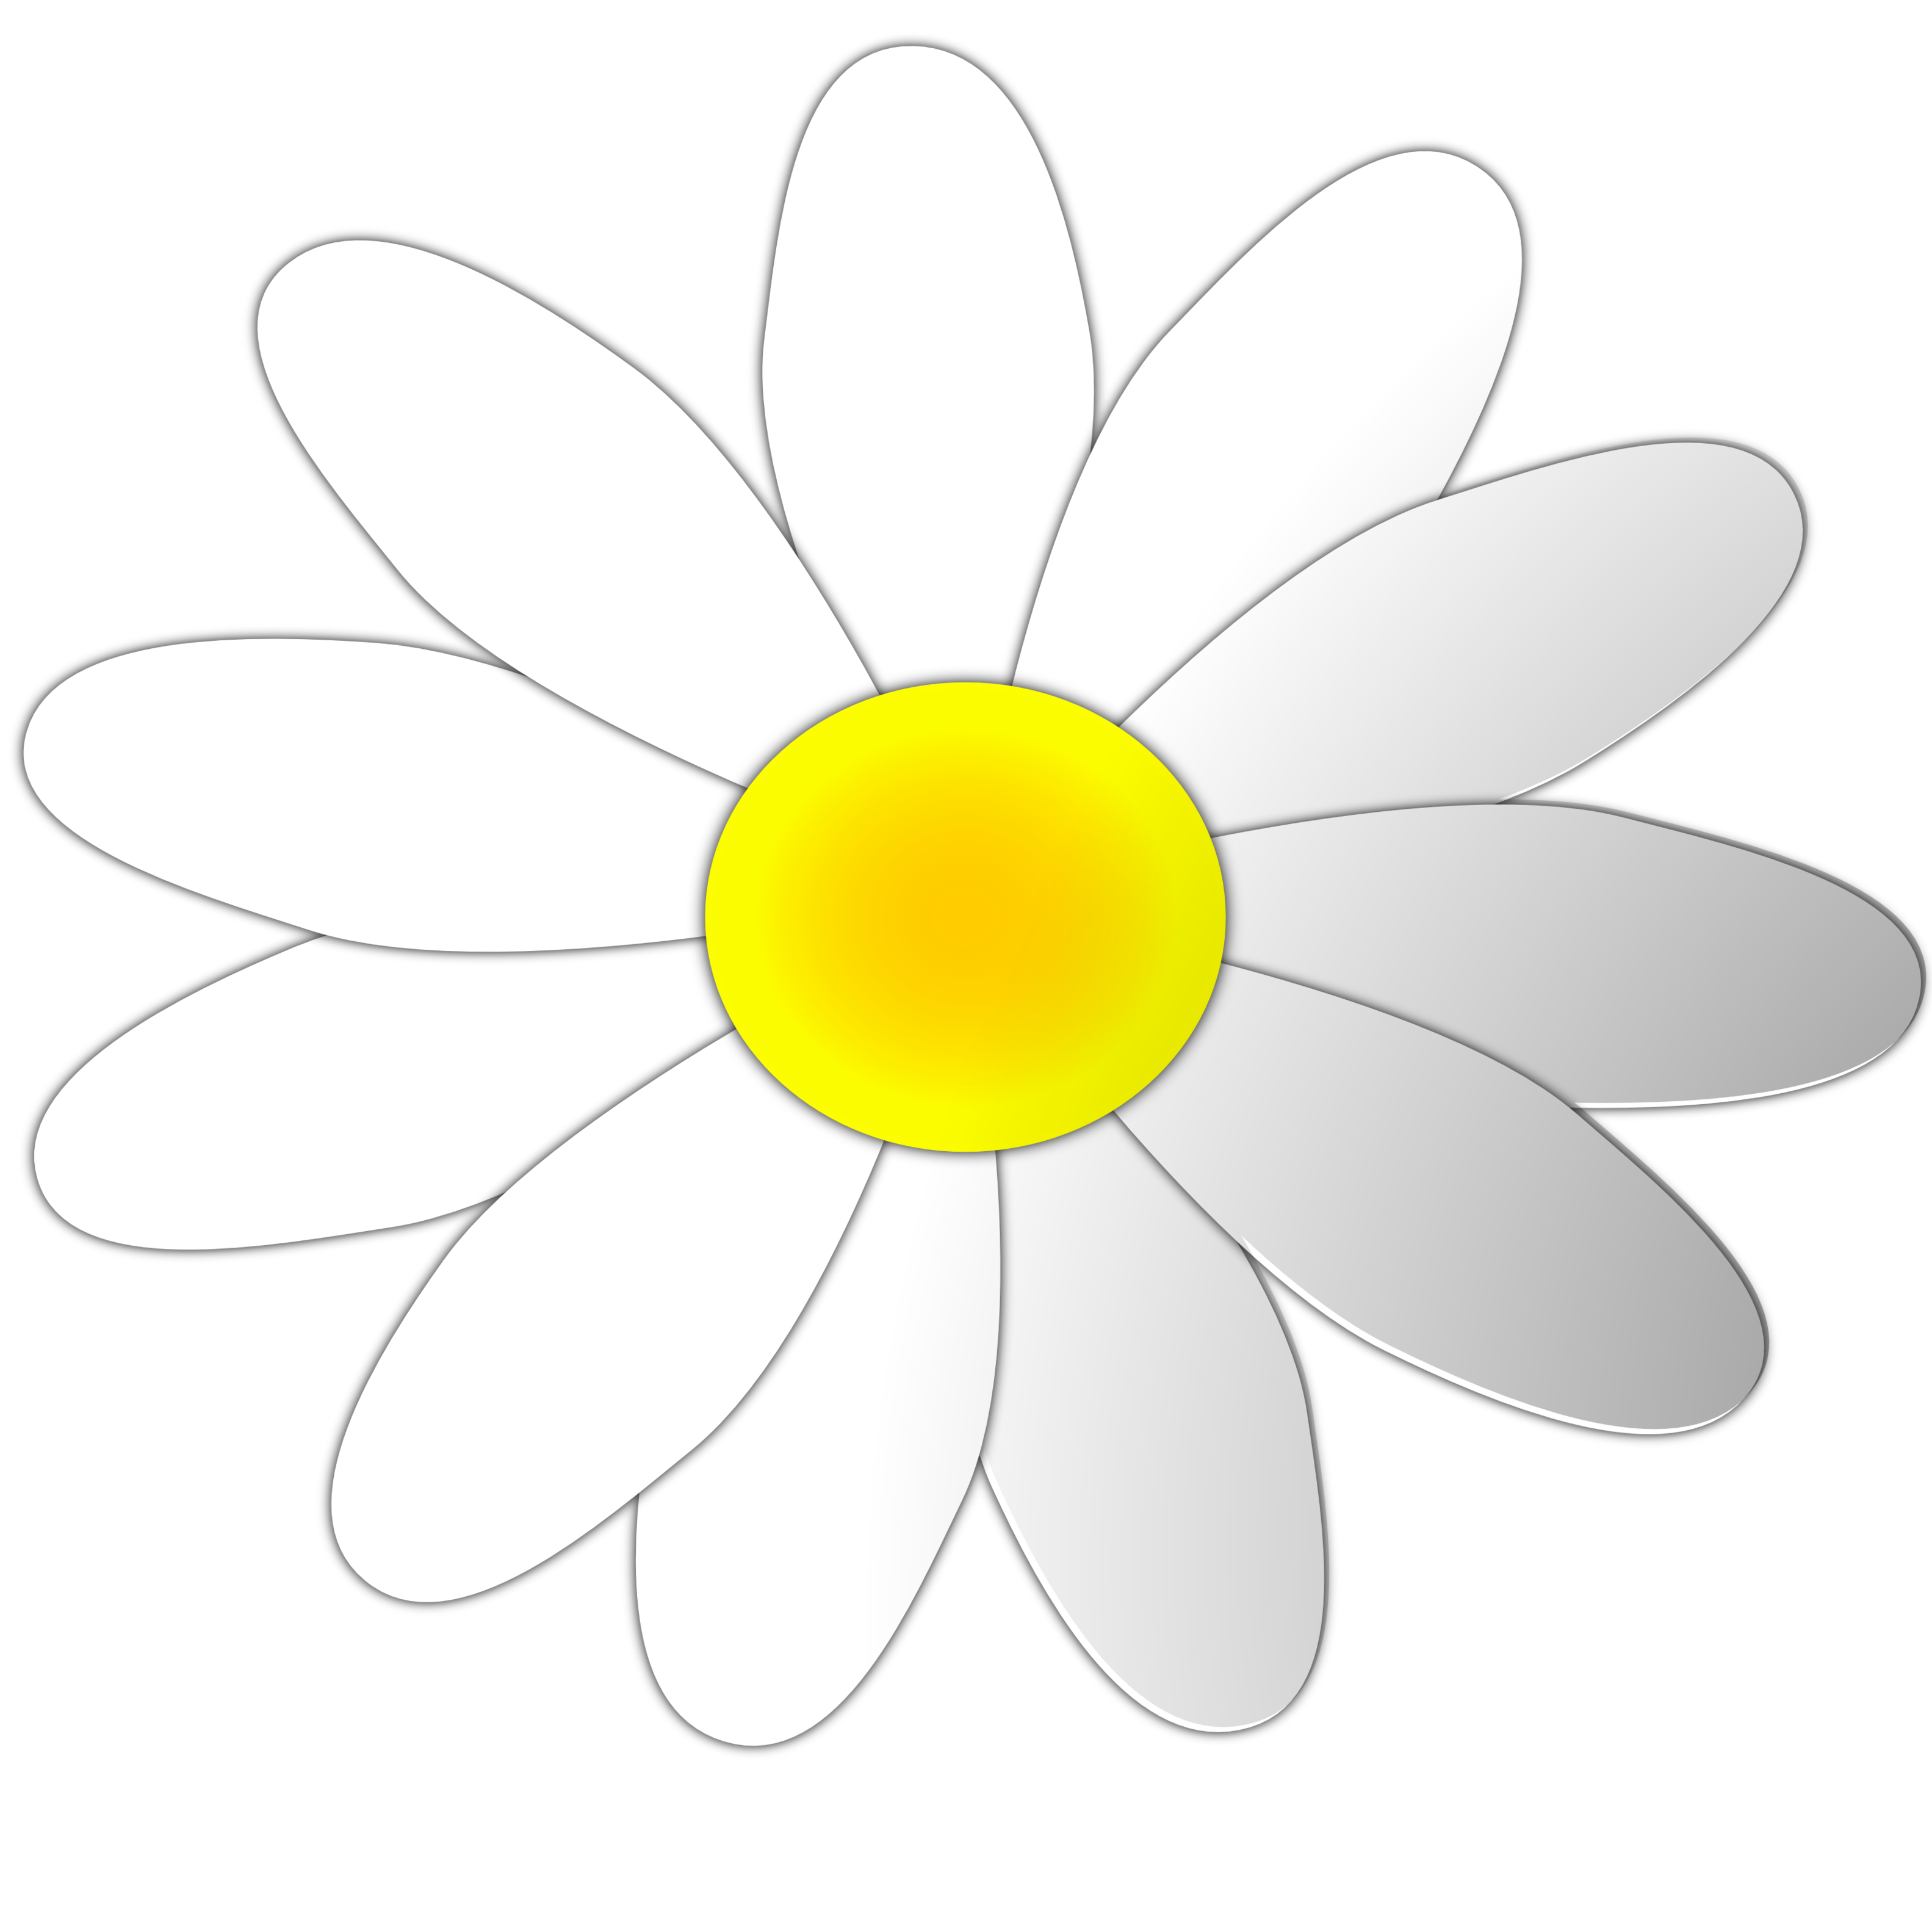 Daisy Flower Clipart. Valenti - Clip Art Daisy